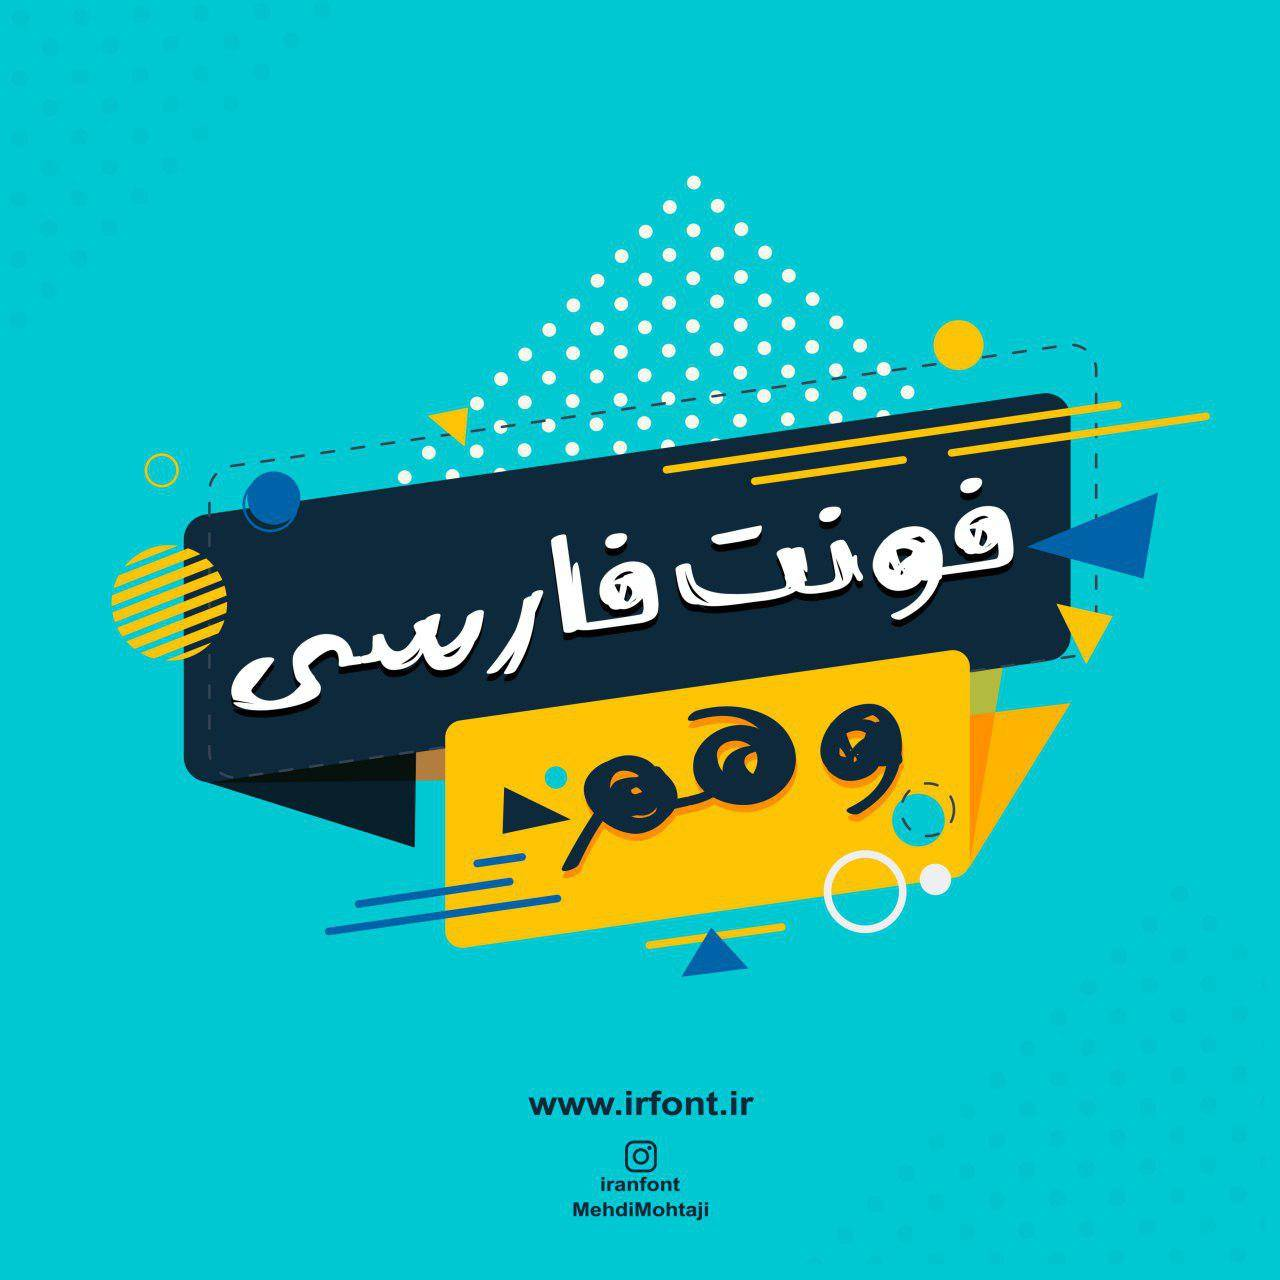 دانلود نسخه فارسی فونت وهم WahmTypeface